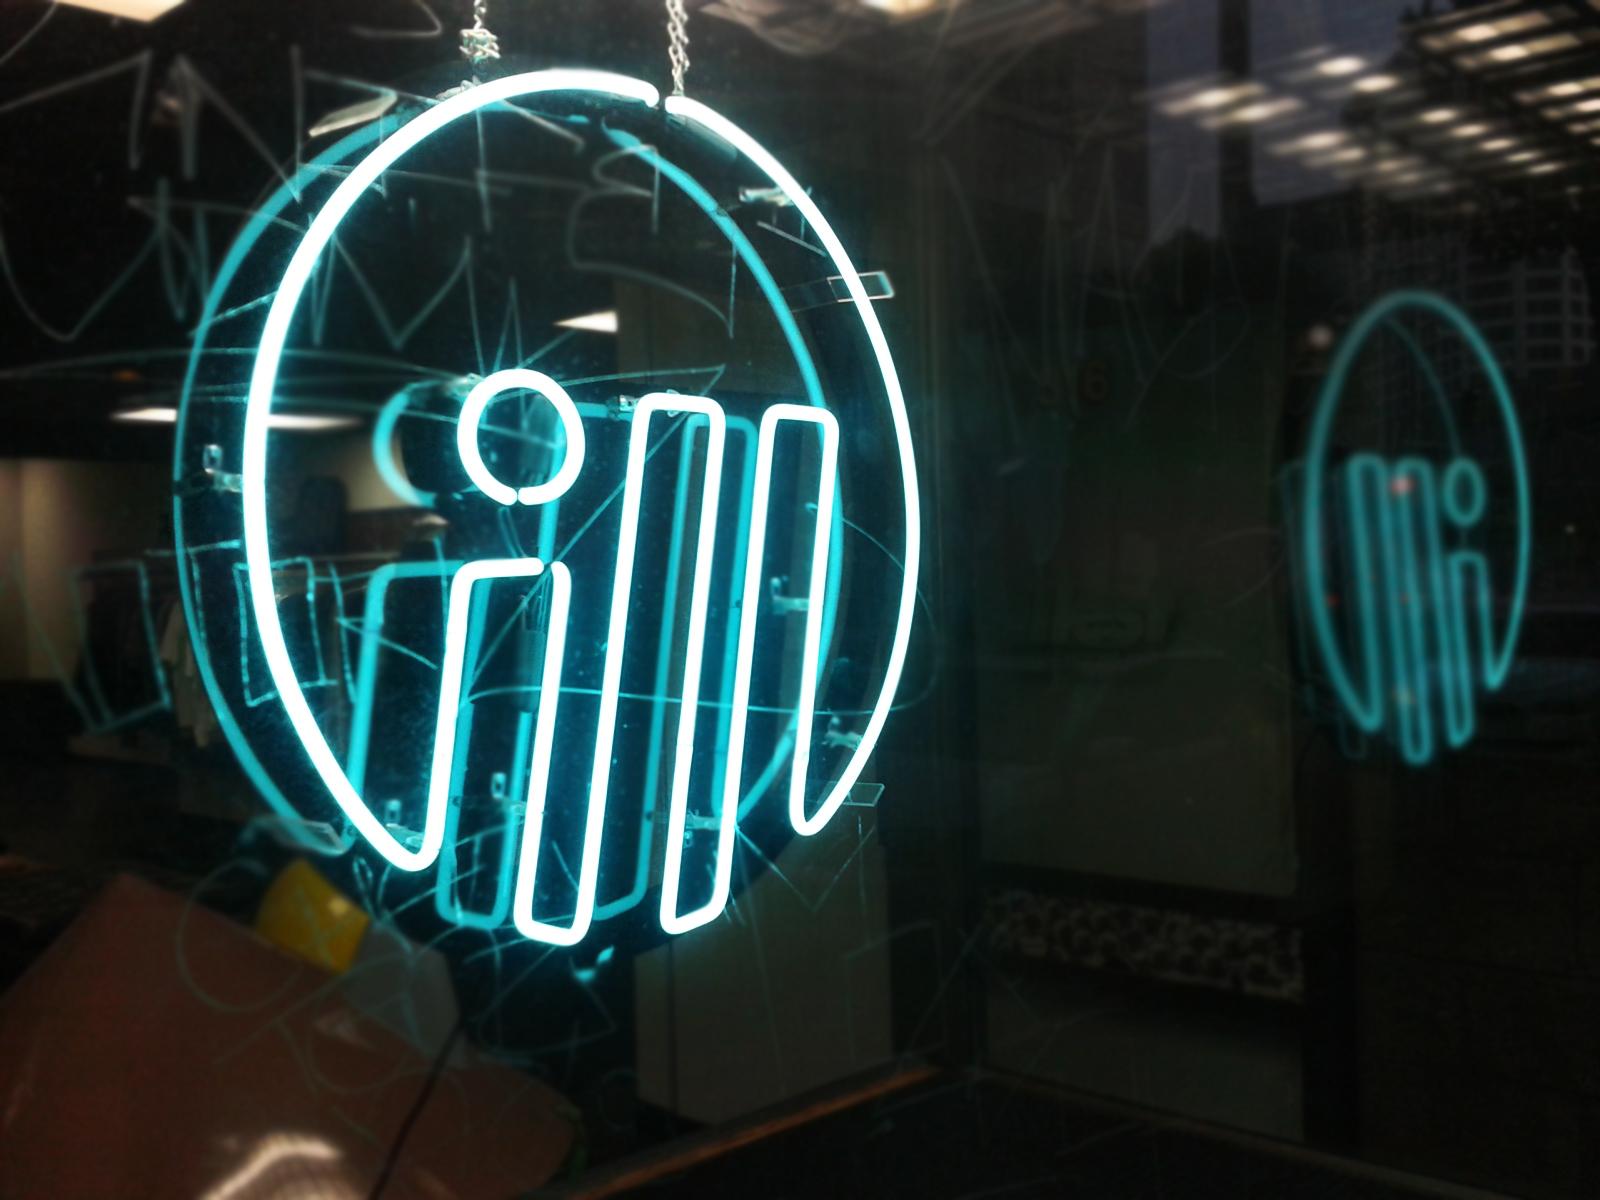 illest logo wallpaper - photo #44